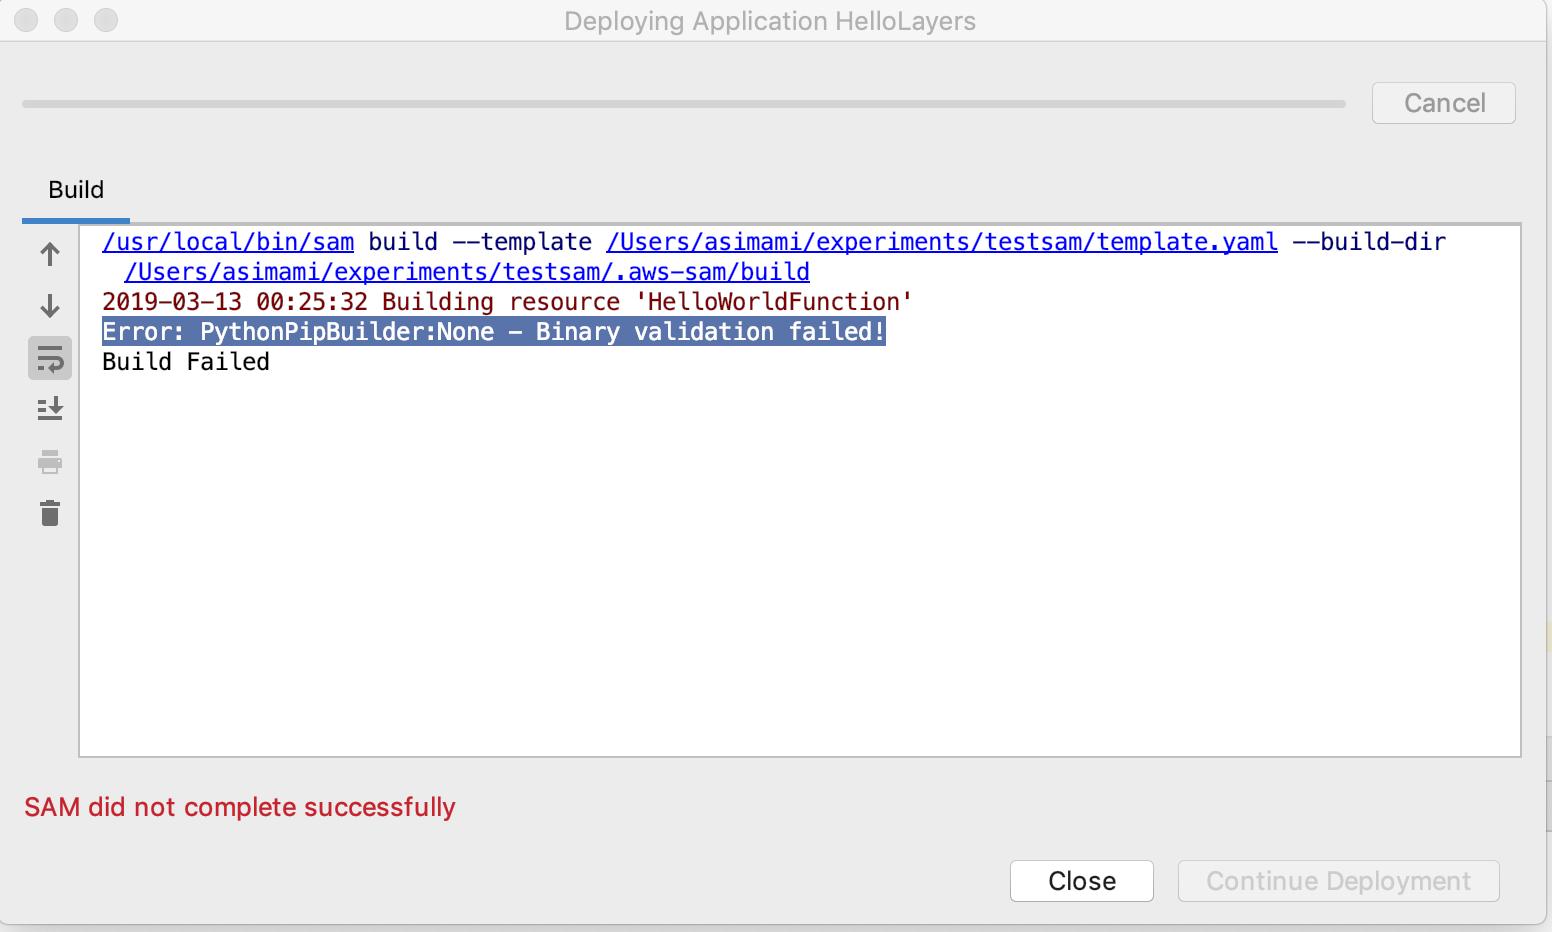 Error: PythonPipBuilder:None - Binary validation failed